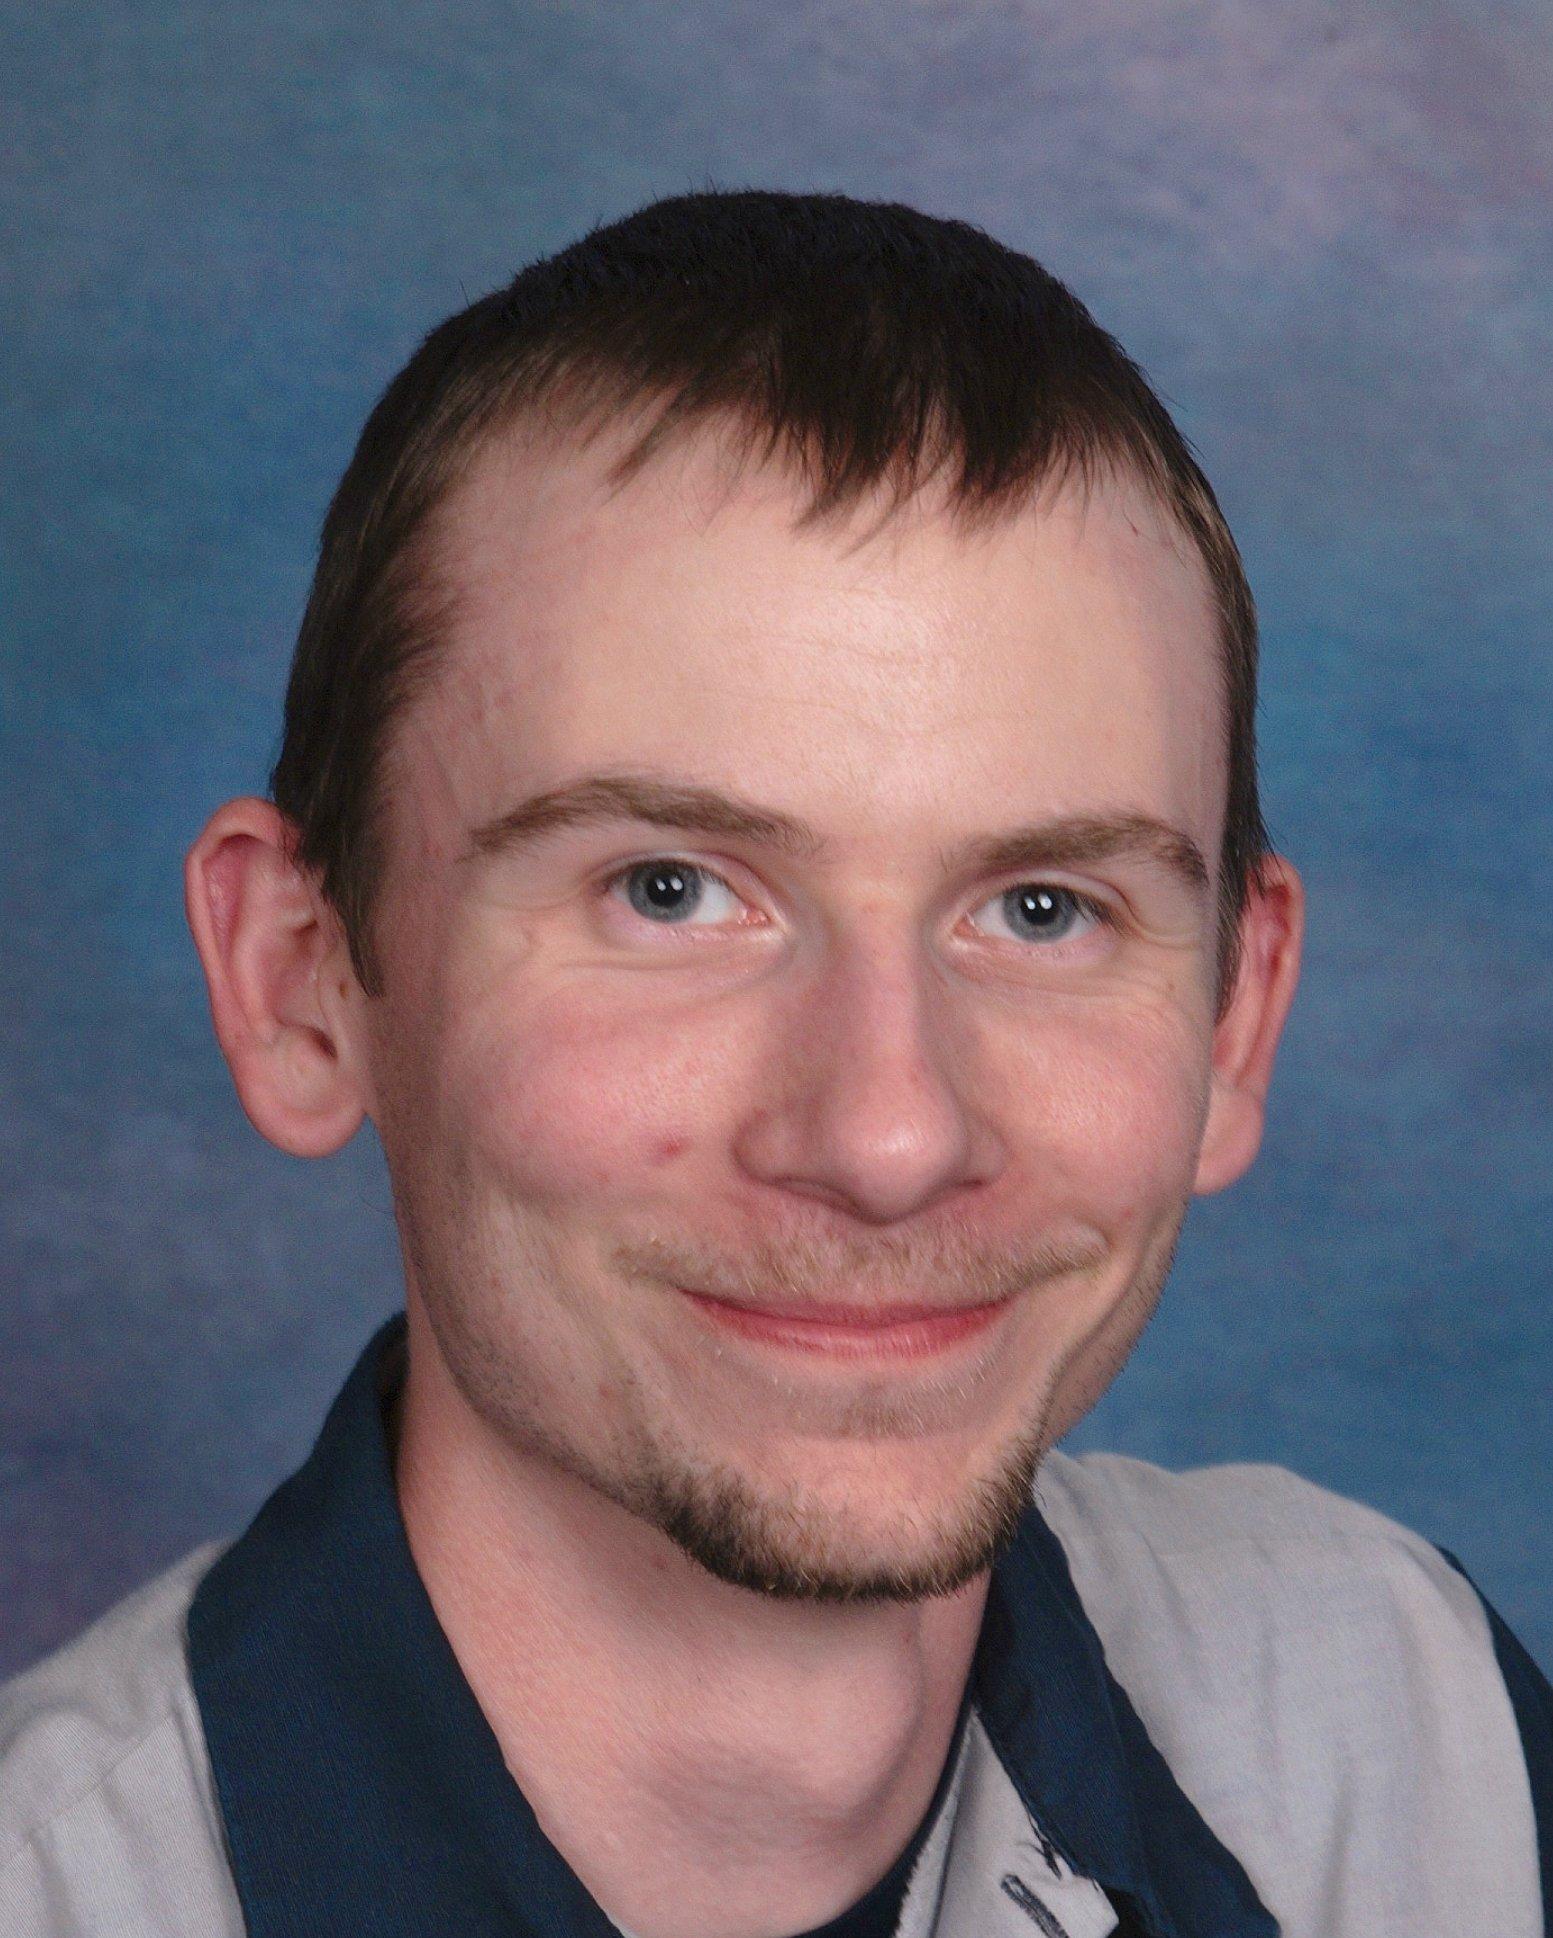 Ryan Barber - Service Technician